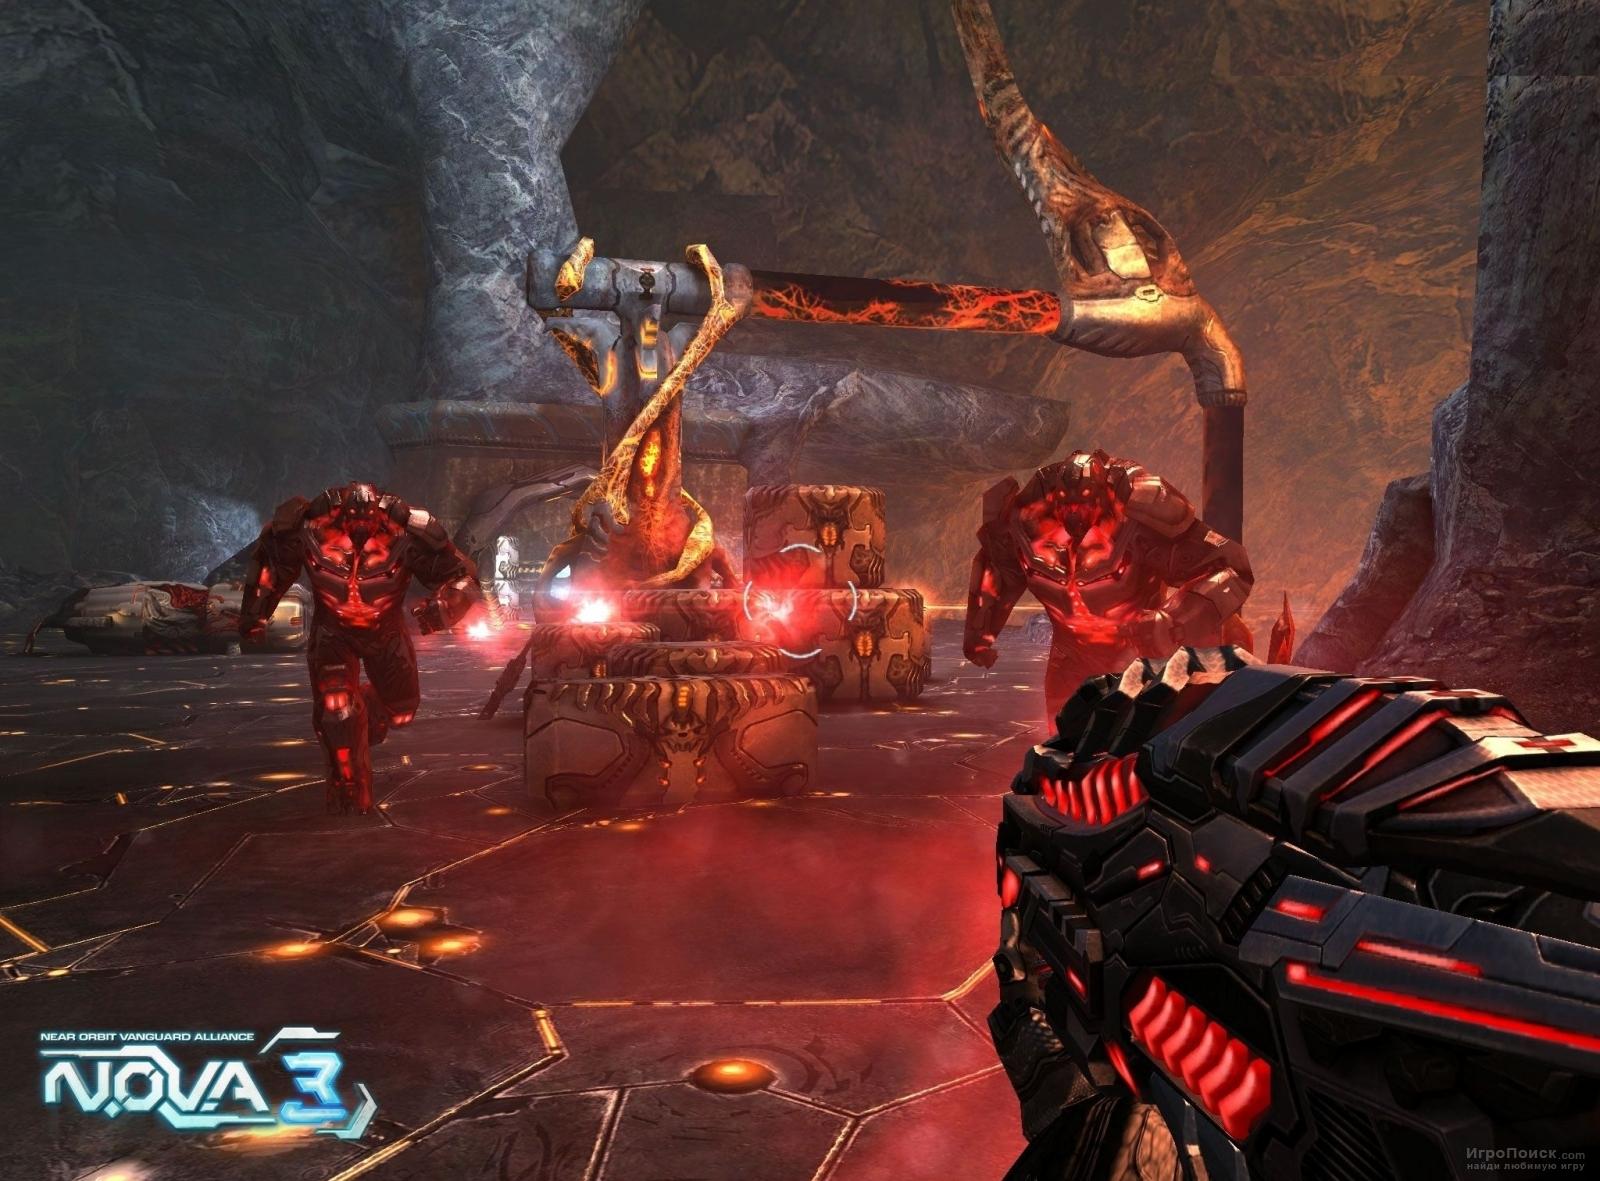 Скриншот к игре N.O.V.A. Near Orbit Vanguard Alliance